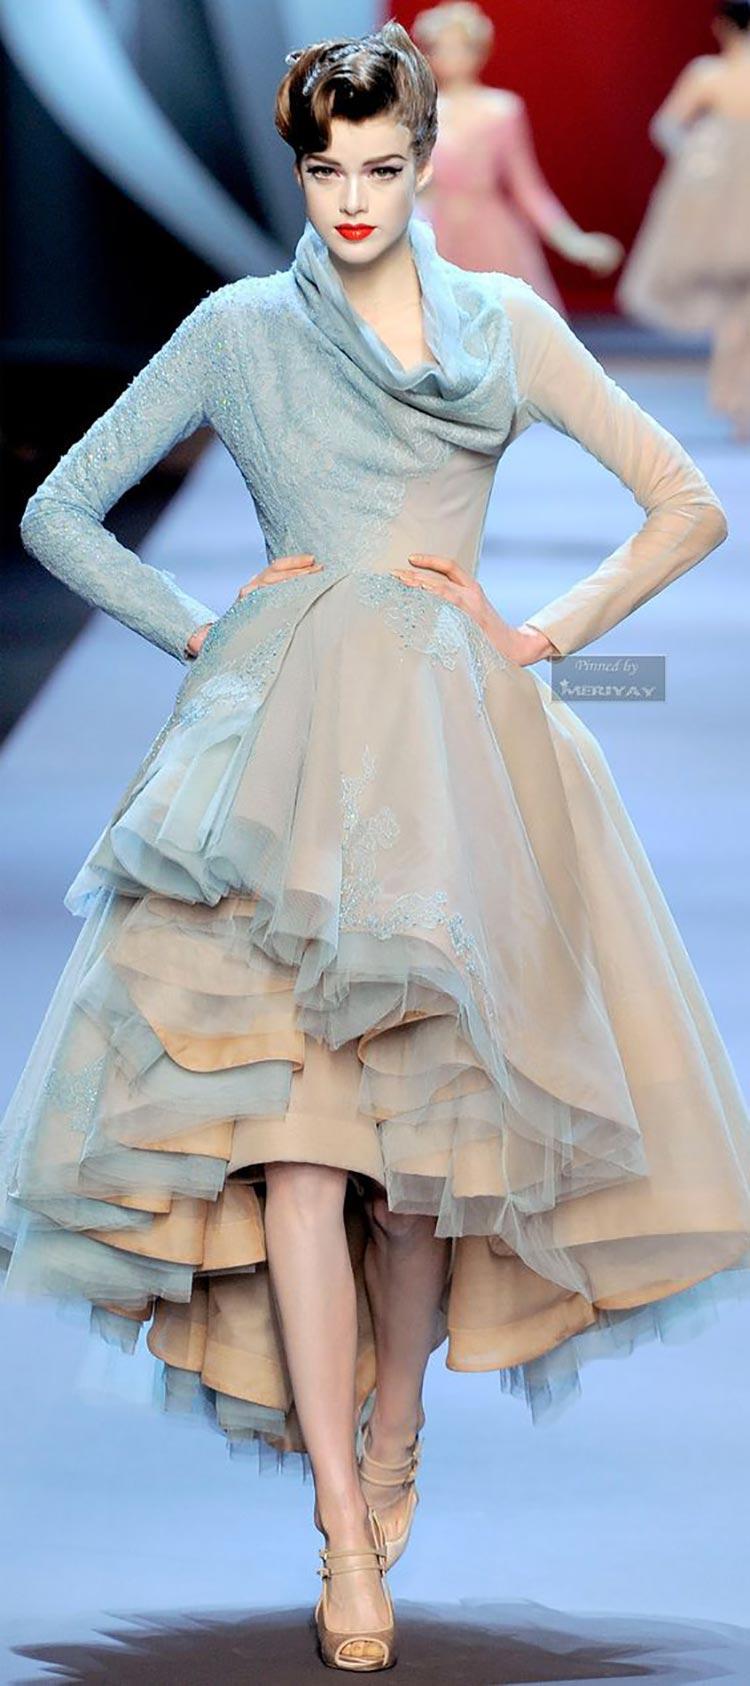 Dior elegance